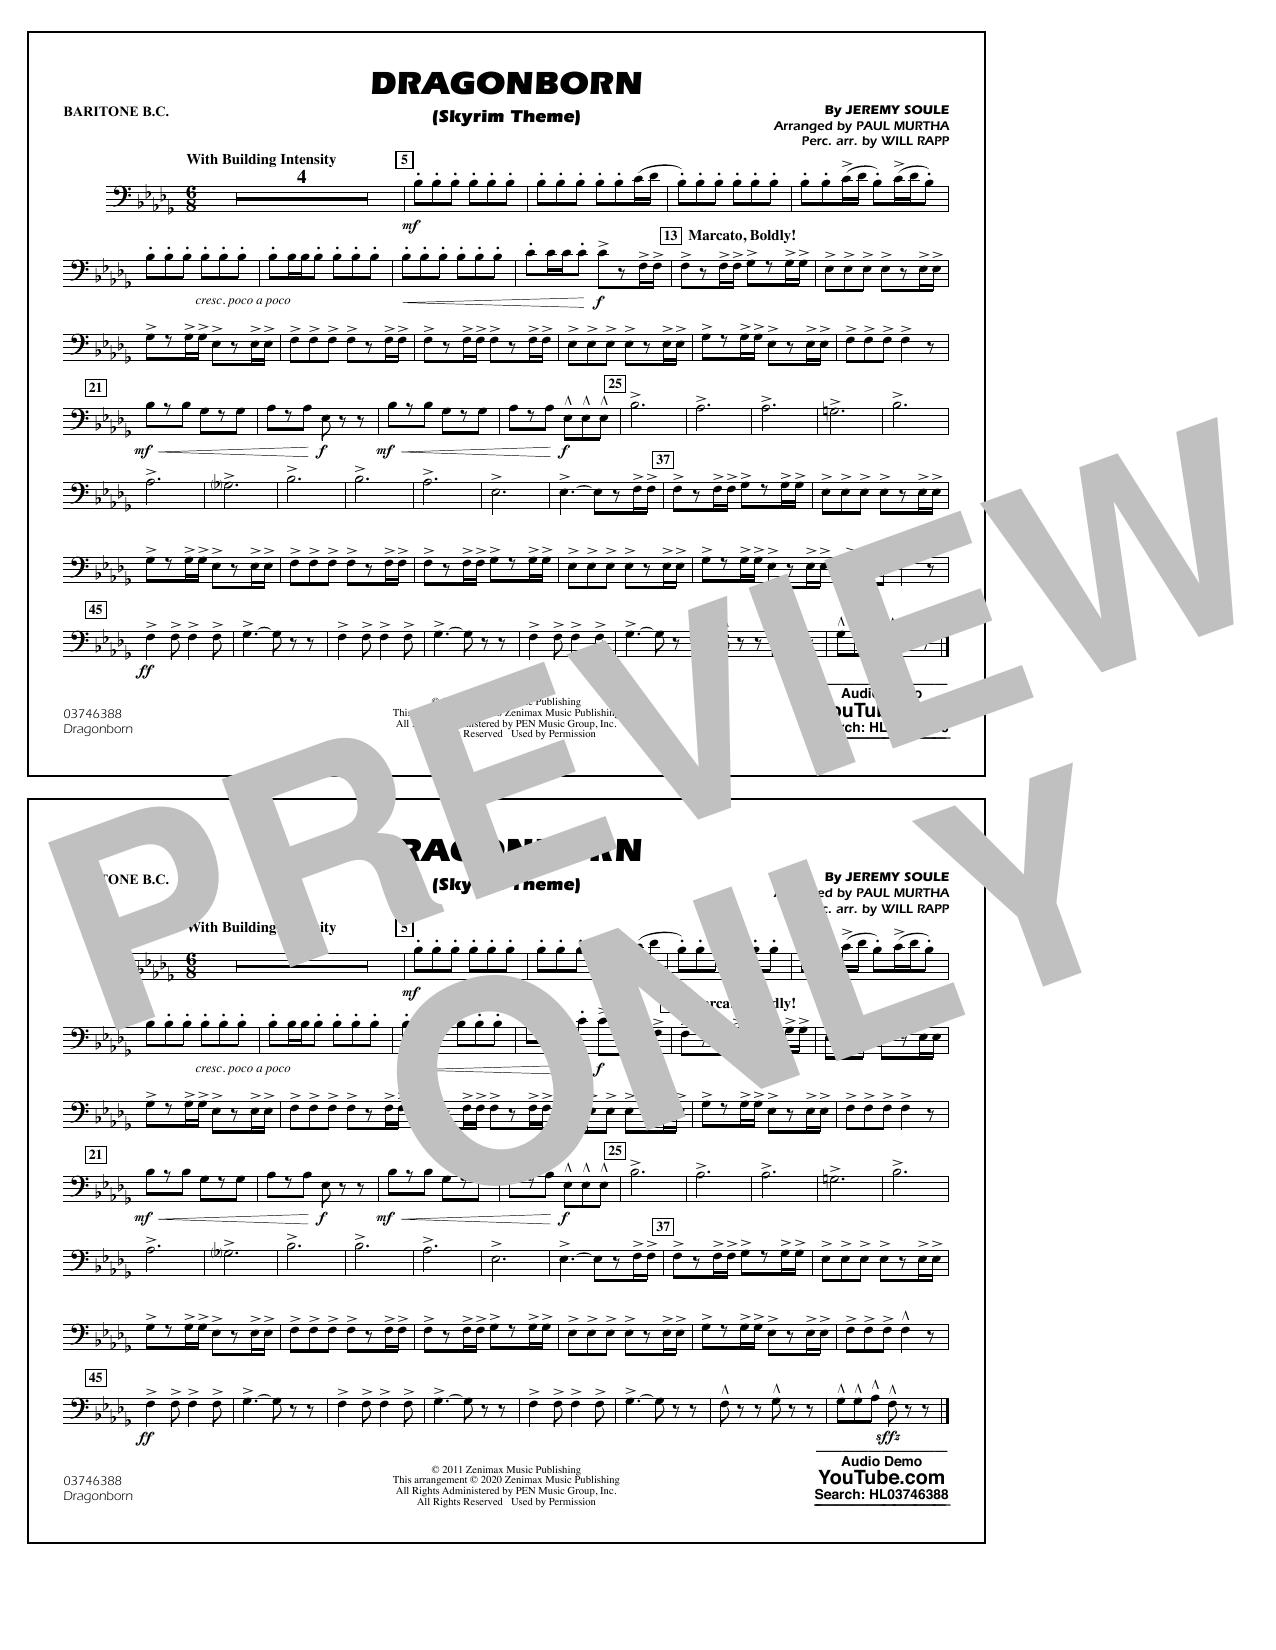 Dragonborn (Skyrim Theme) (arr. Will Rapp & Paul Murtha) - Baritone B.C. Sheet Music